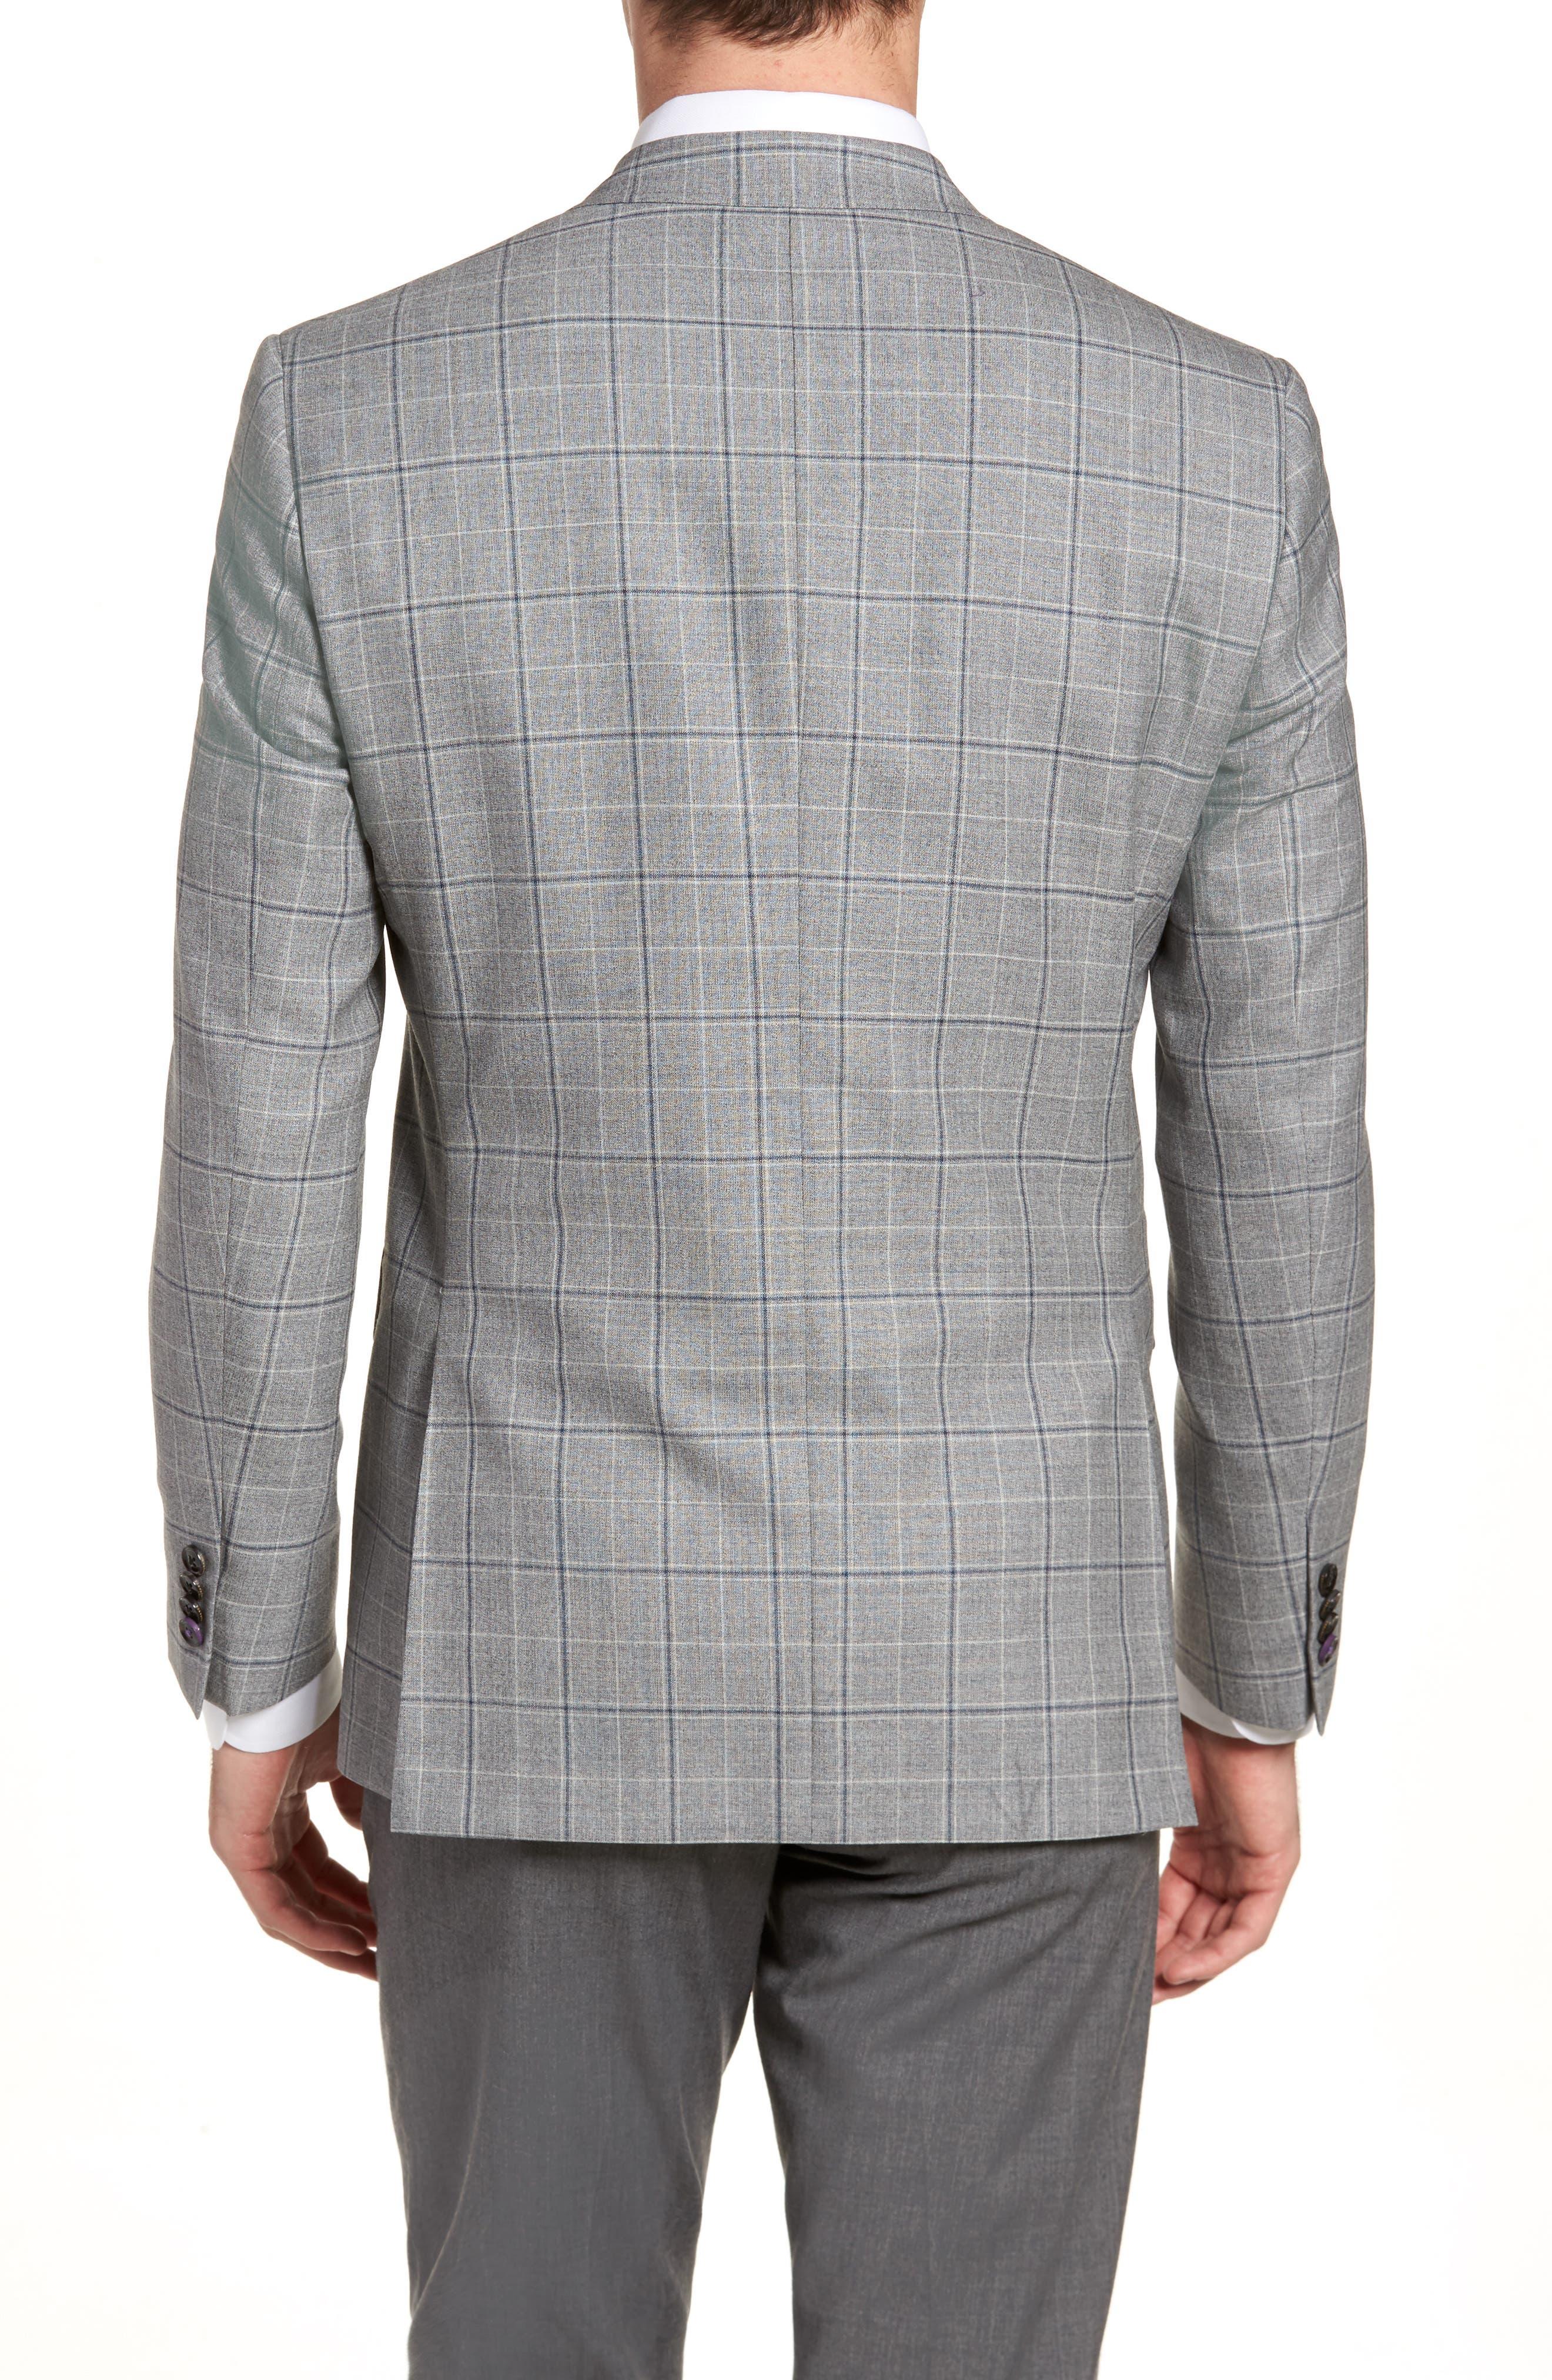 Jay Trim Fit Plaid Wool Sport Coat,                             Alternate thumbnail 2, color,                             050